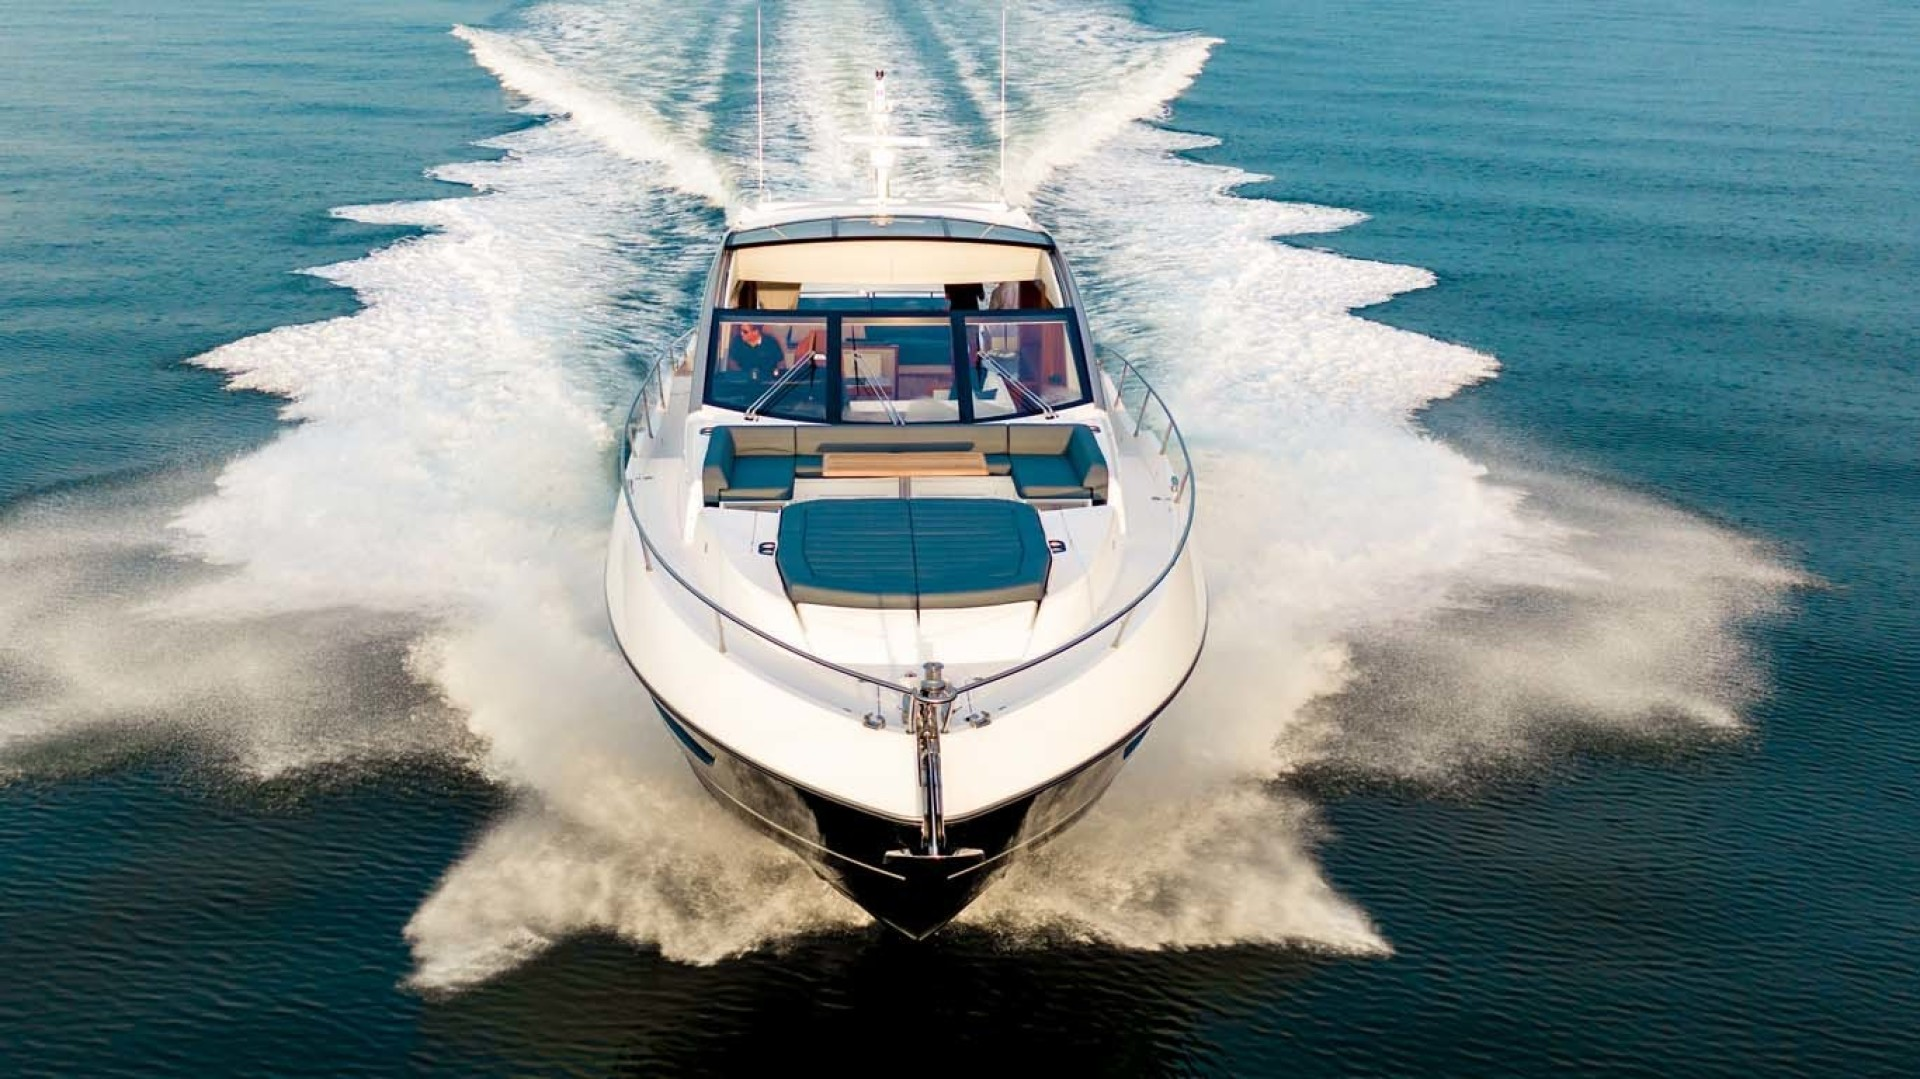 Sunseeker-Predator 2020-WIND@SEA Ft. Lauderdale-Florida-United States-Bow-1457474 | Thumbnail